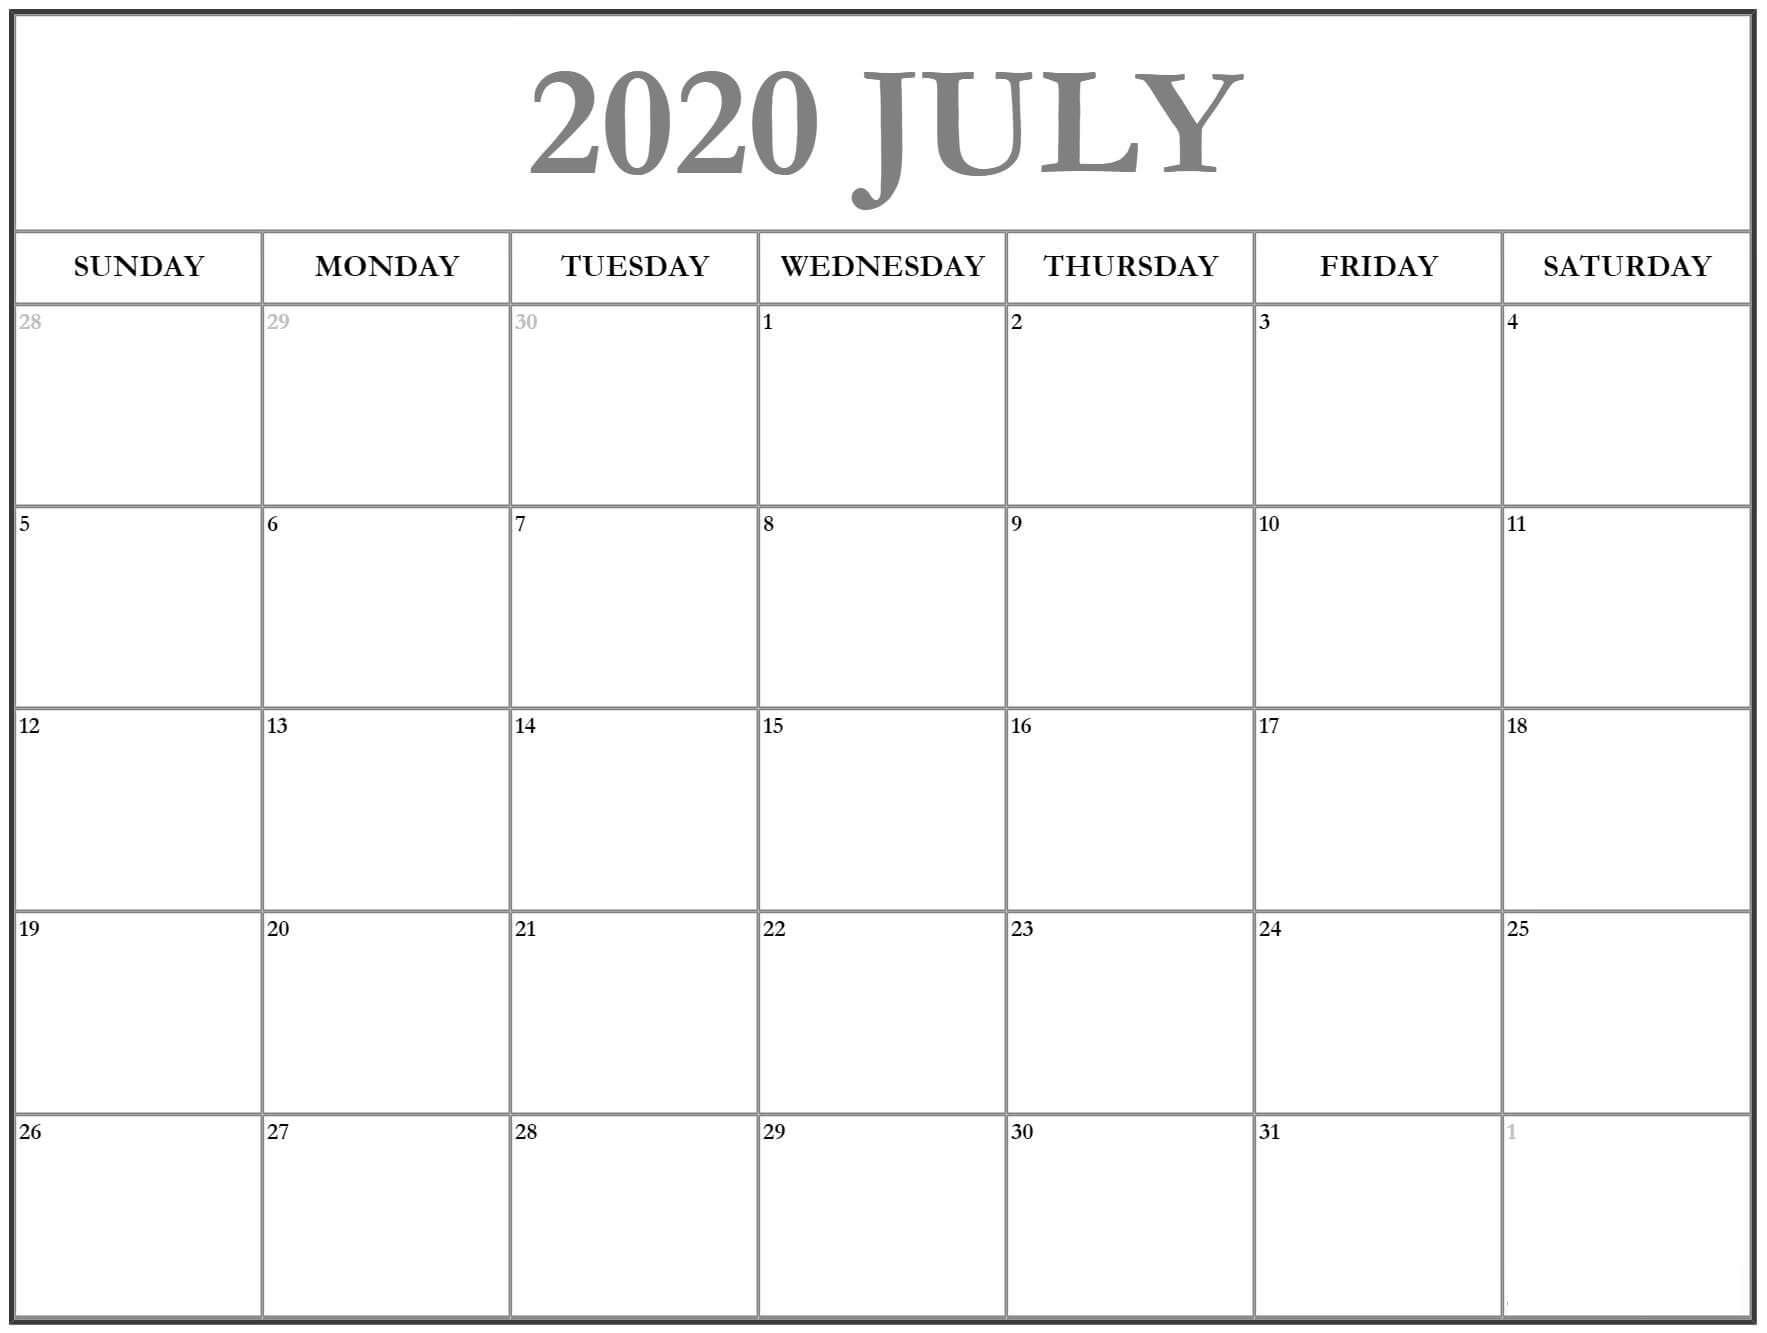 Blank July 2020 Calendar With Holidays